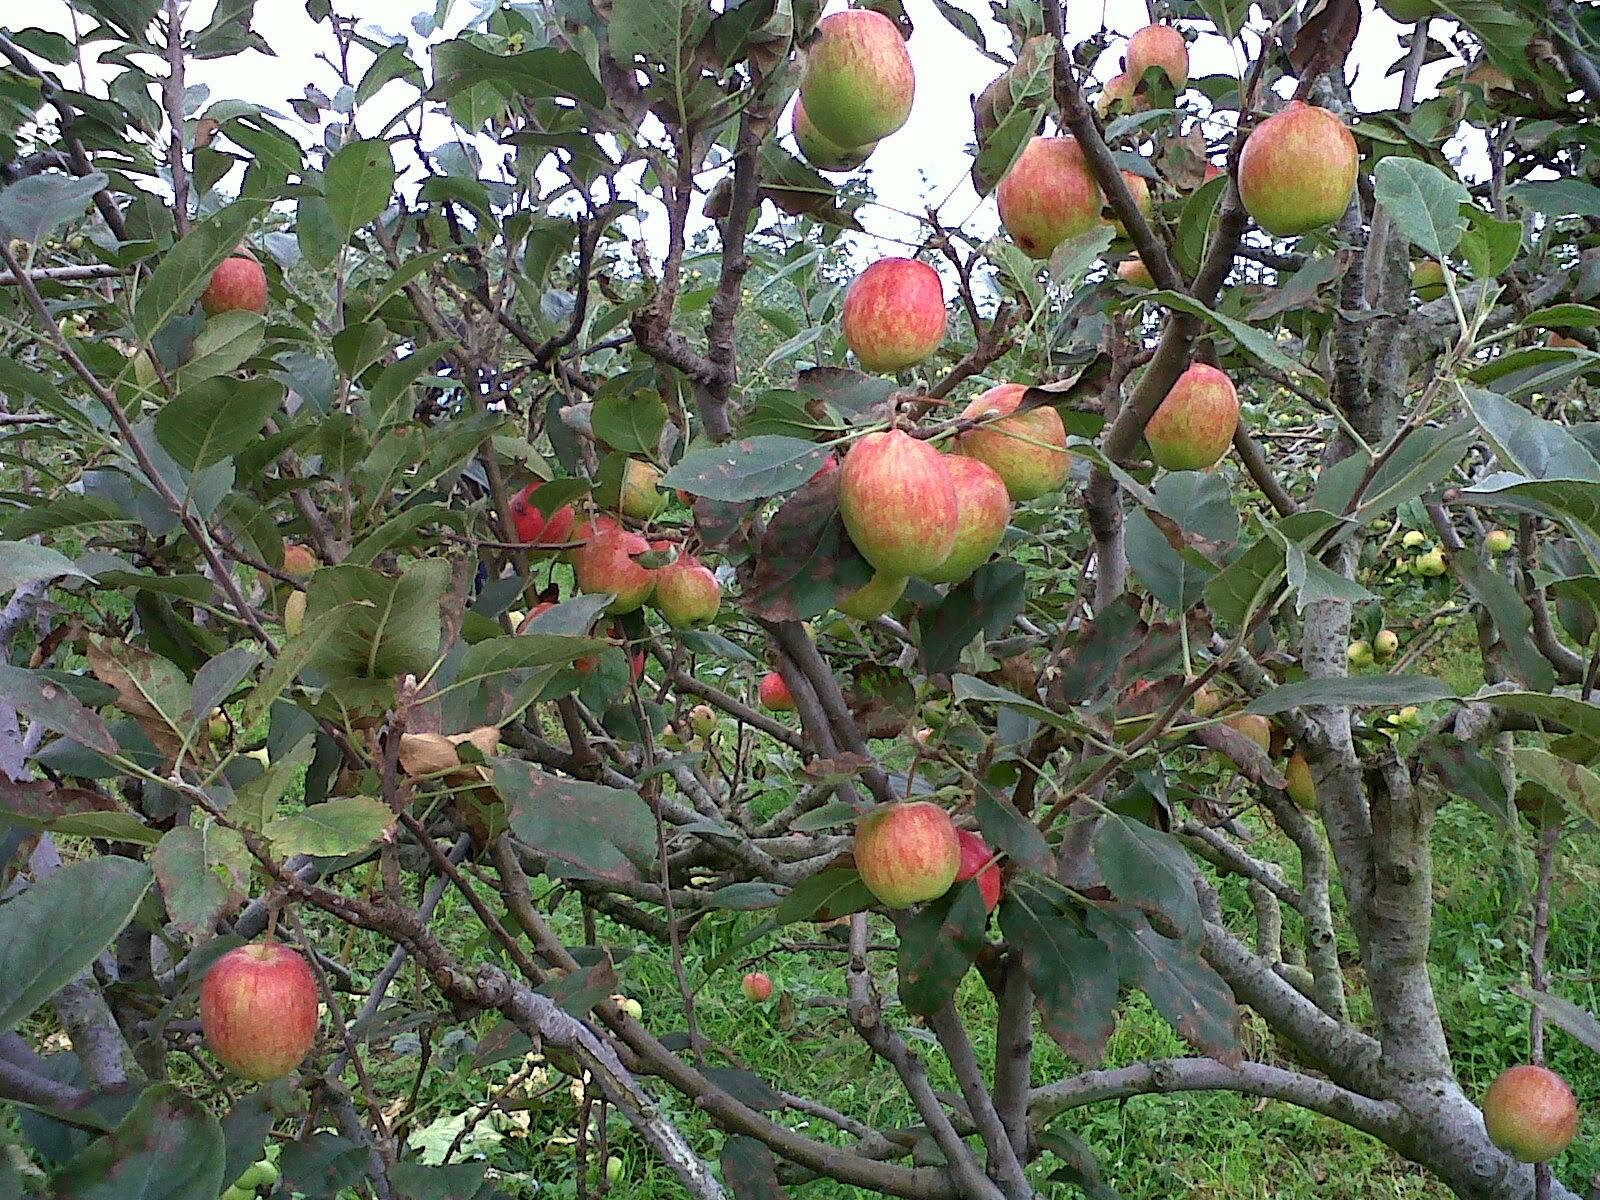 galena wisata petik apel